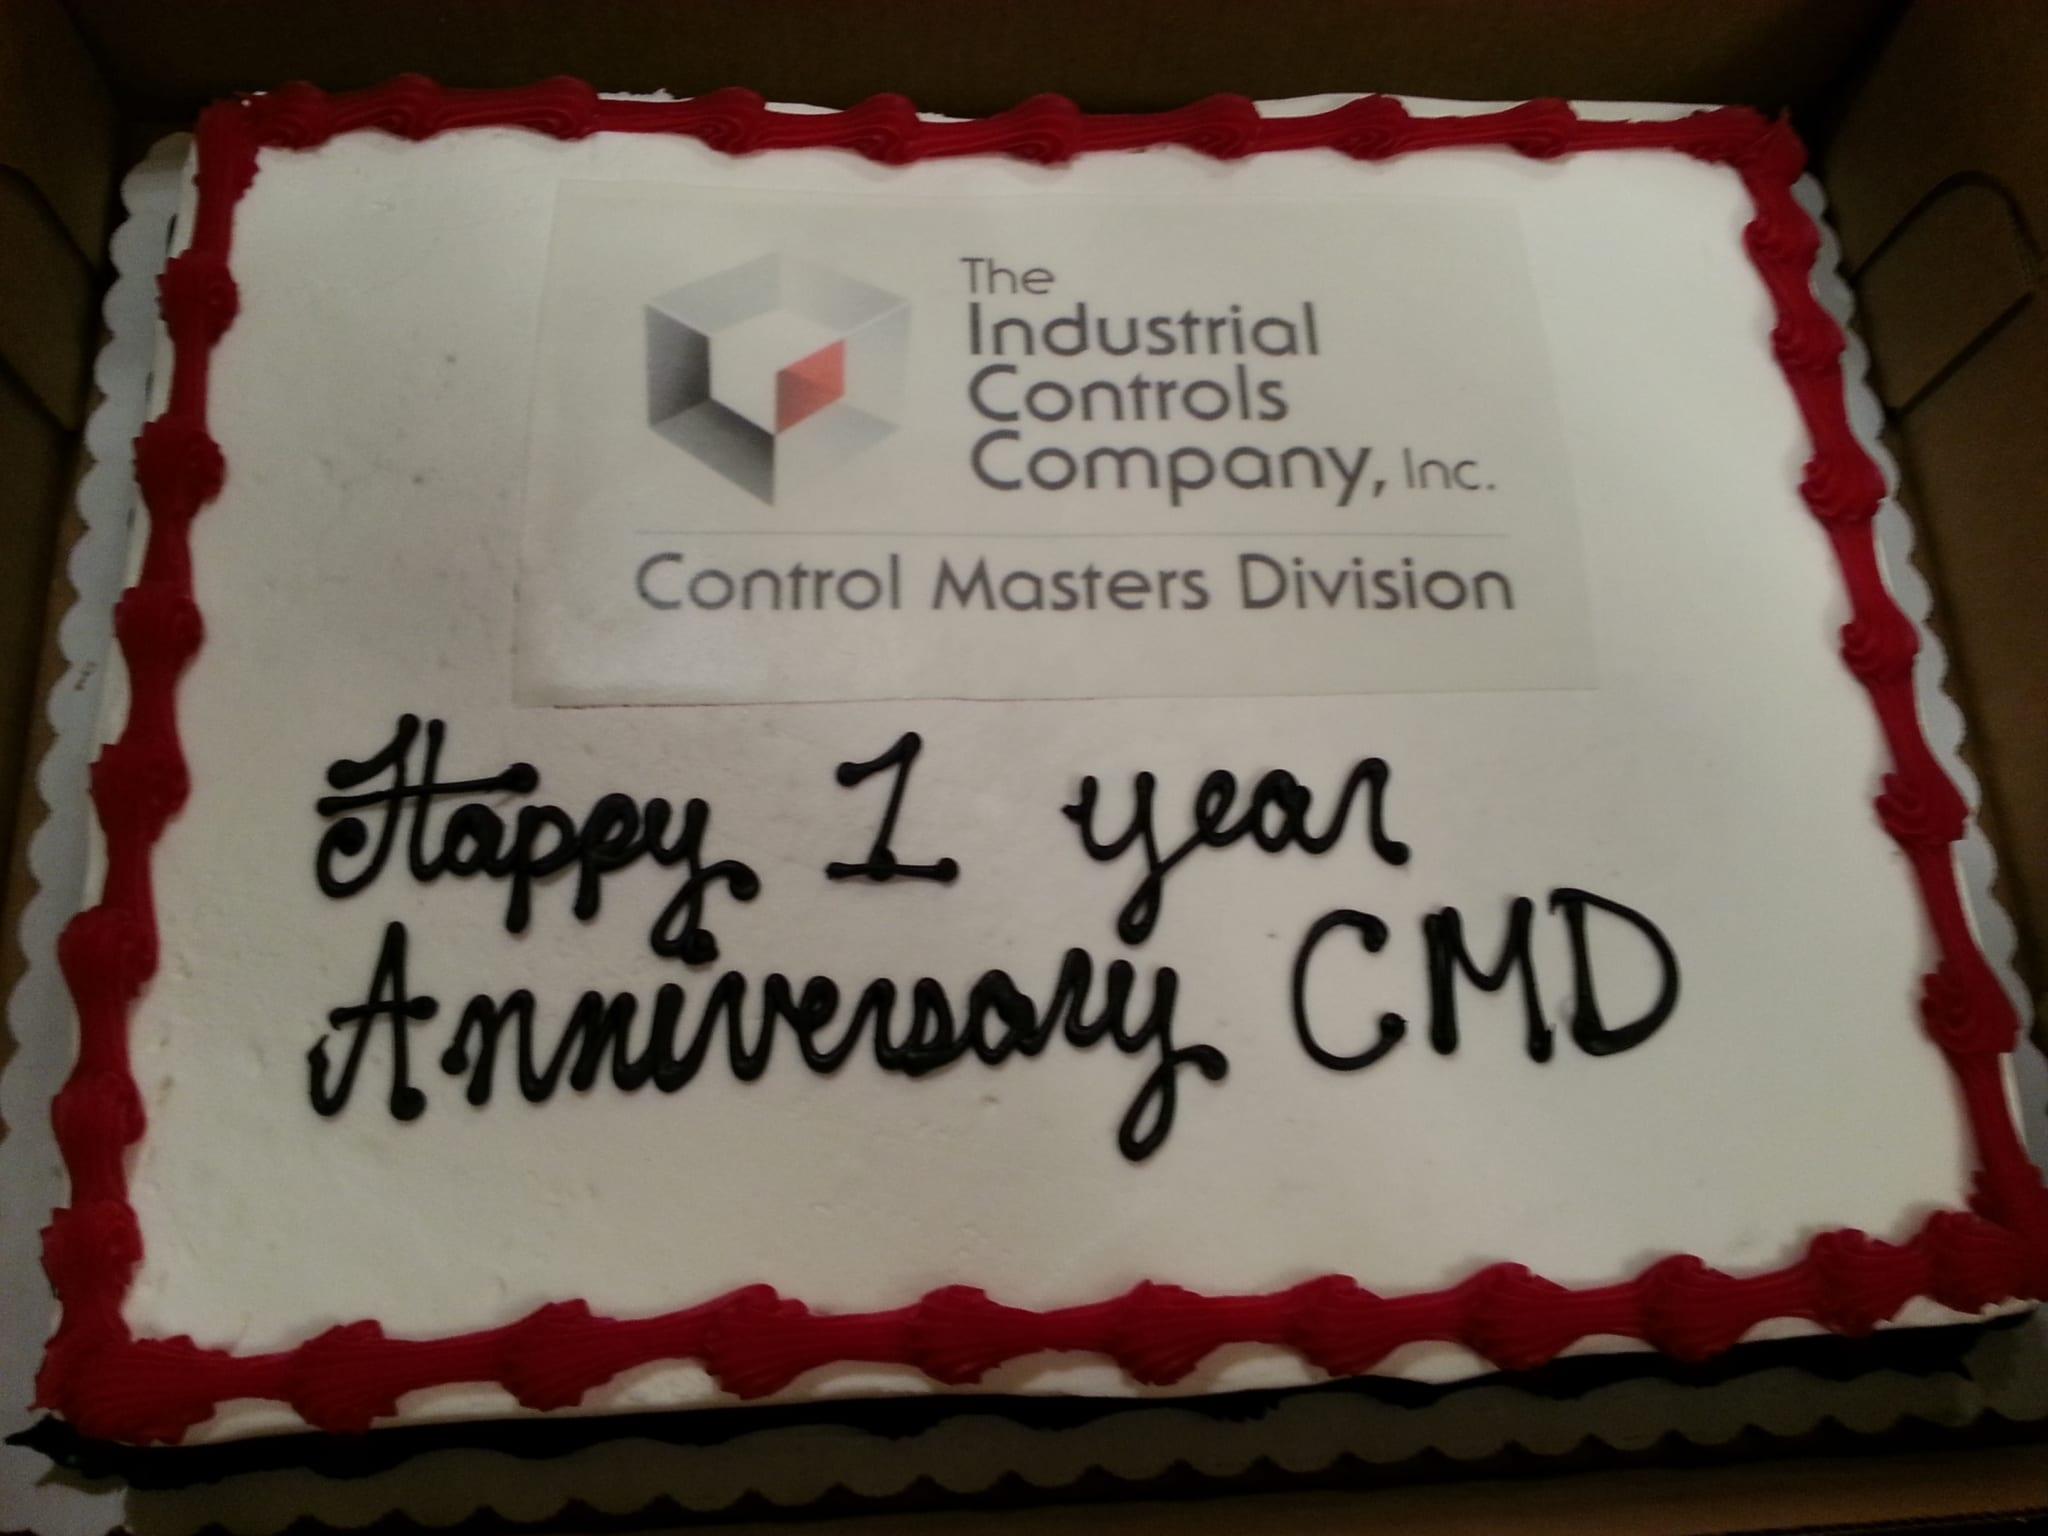 Control Masters Division Celebrates Anniversary